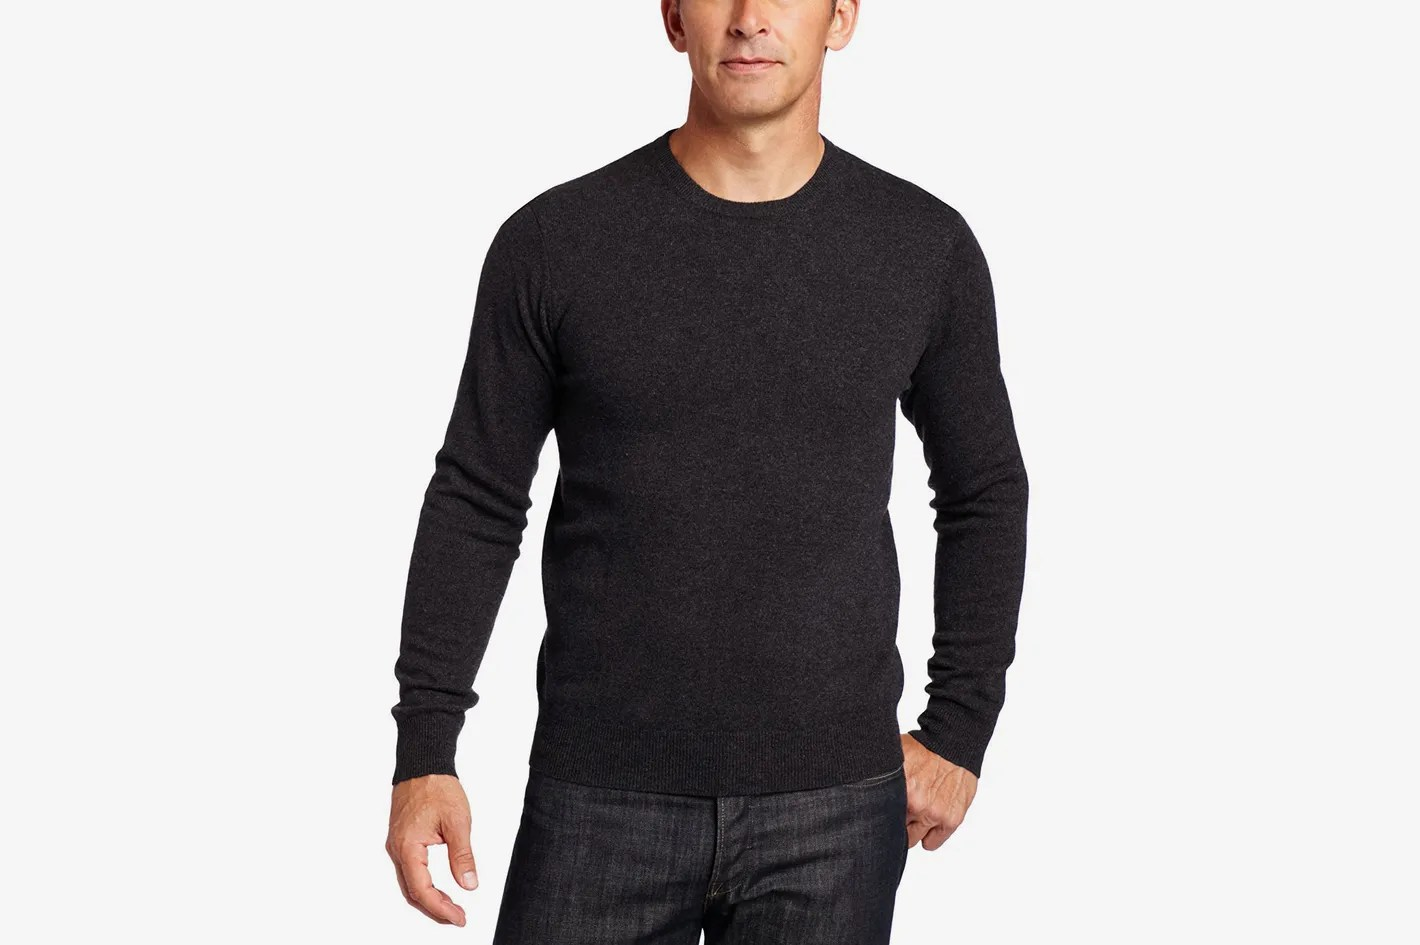 15 Best Men's Sweaters On Amazon, Reviewed: 2018